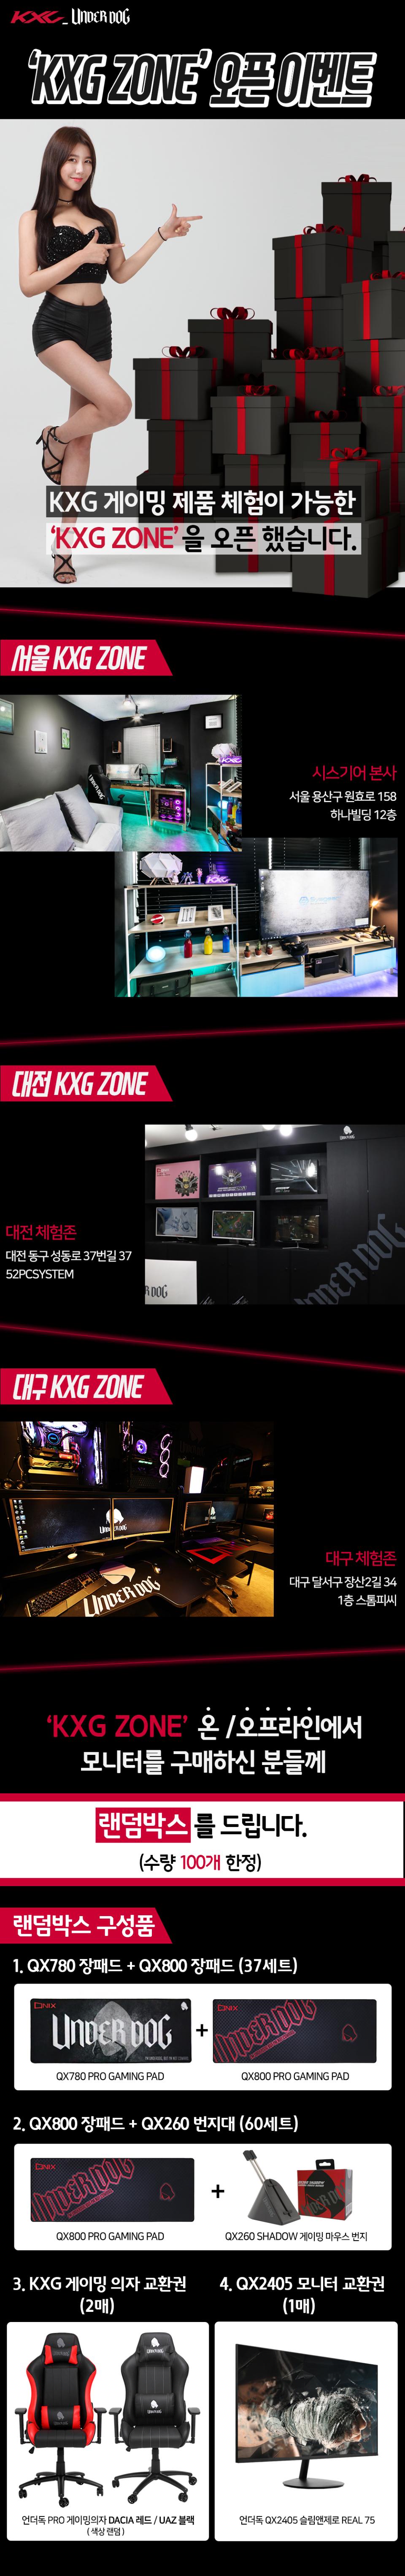 KXGZONE 이벤트 펭지ㅣ.png